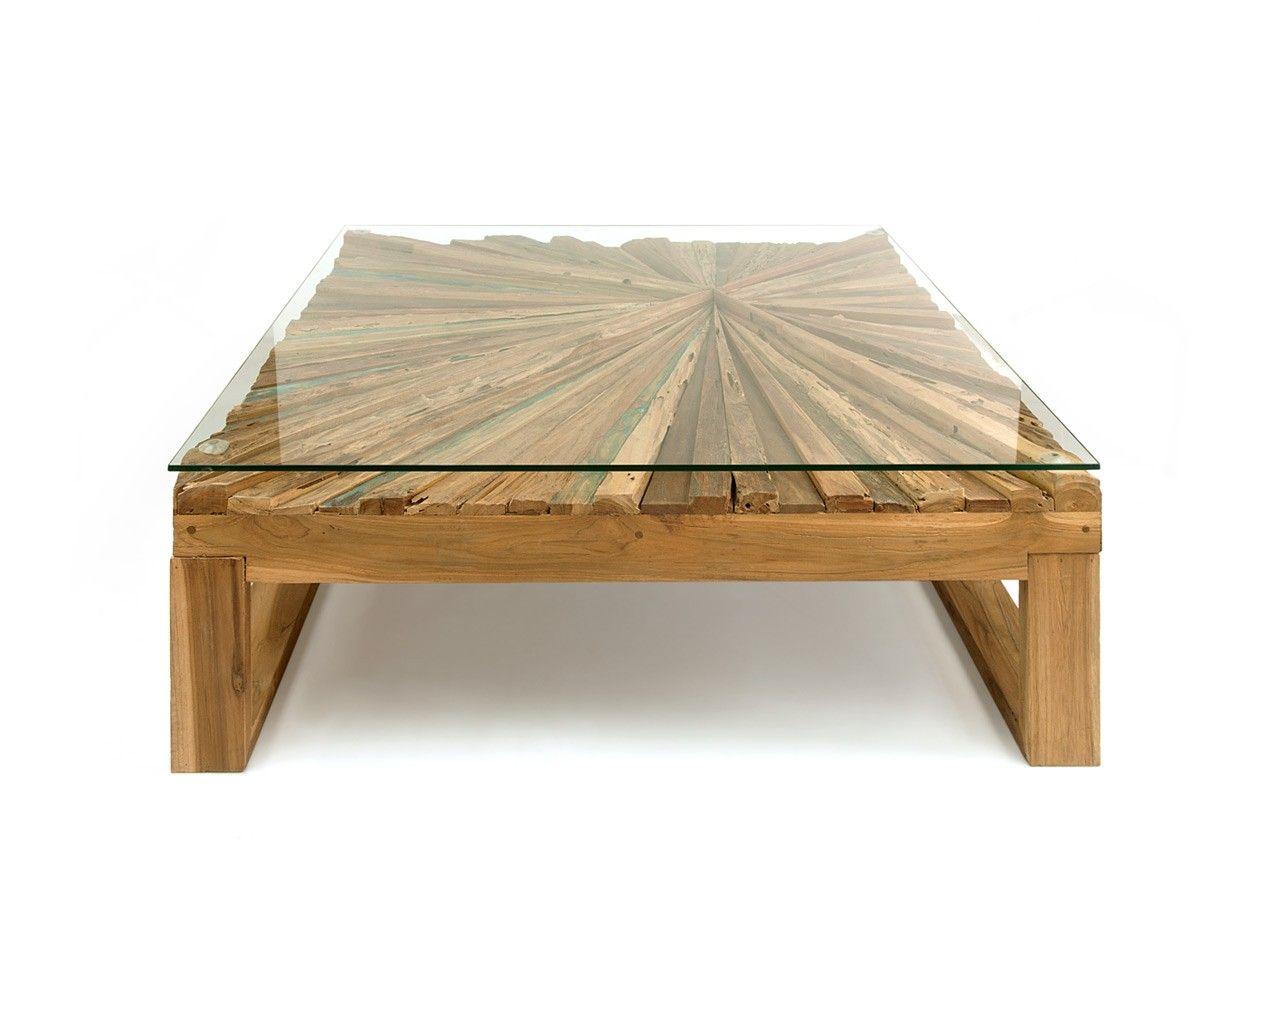 Sunburst Rustic Coffee Table Rectangular Wood Coffee Table Rustic Coffee Table Wood Coffee Table [ 1024 x 1280 Pixel ]